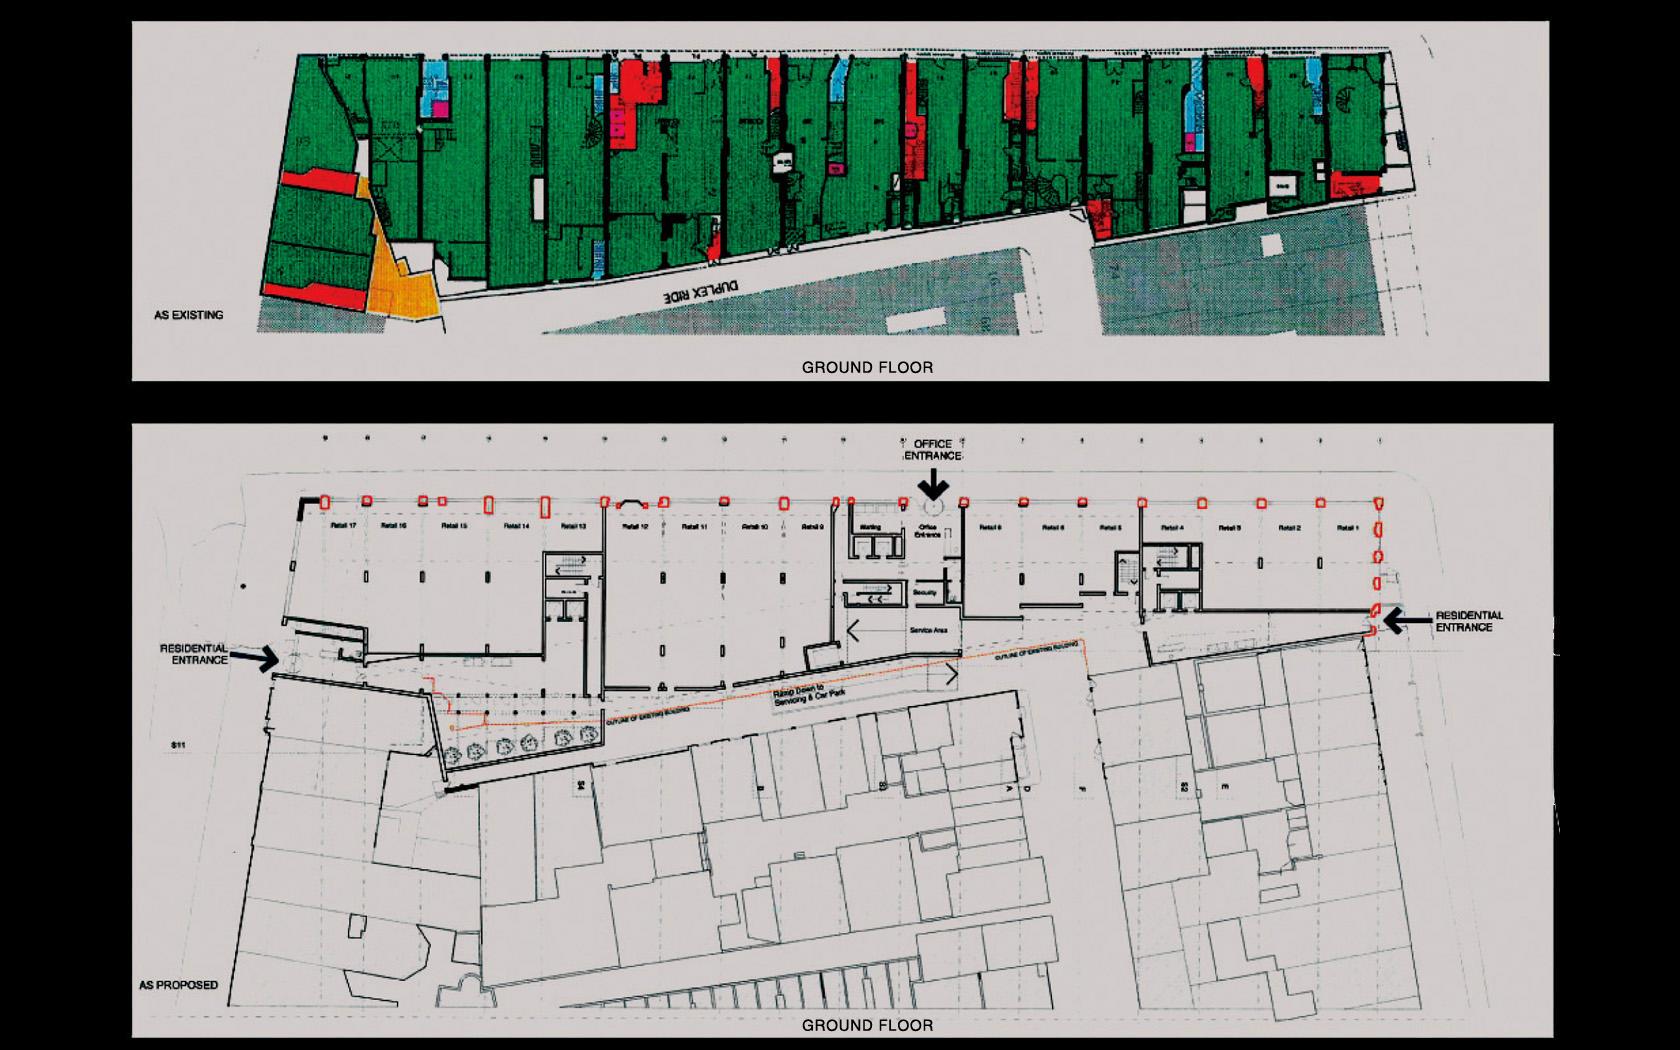 Architettura Knightsbridge London